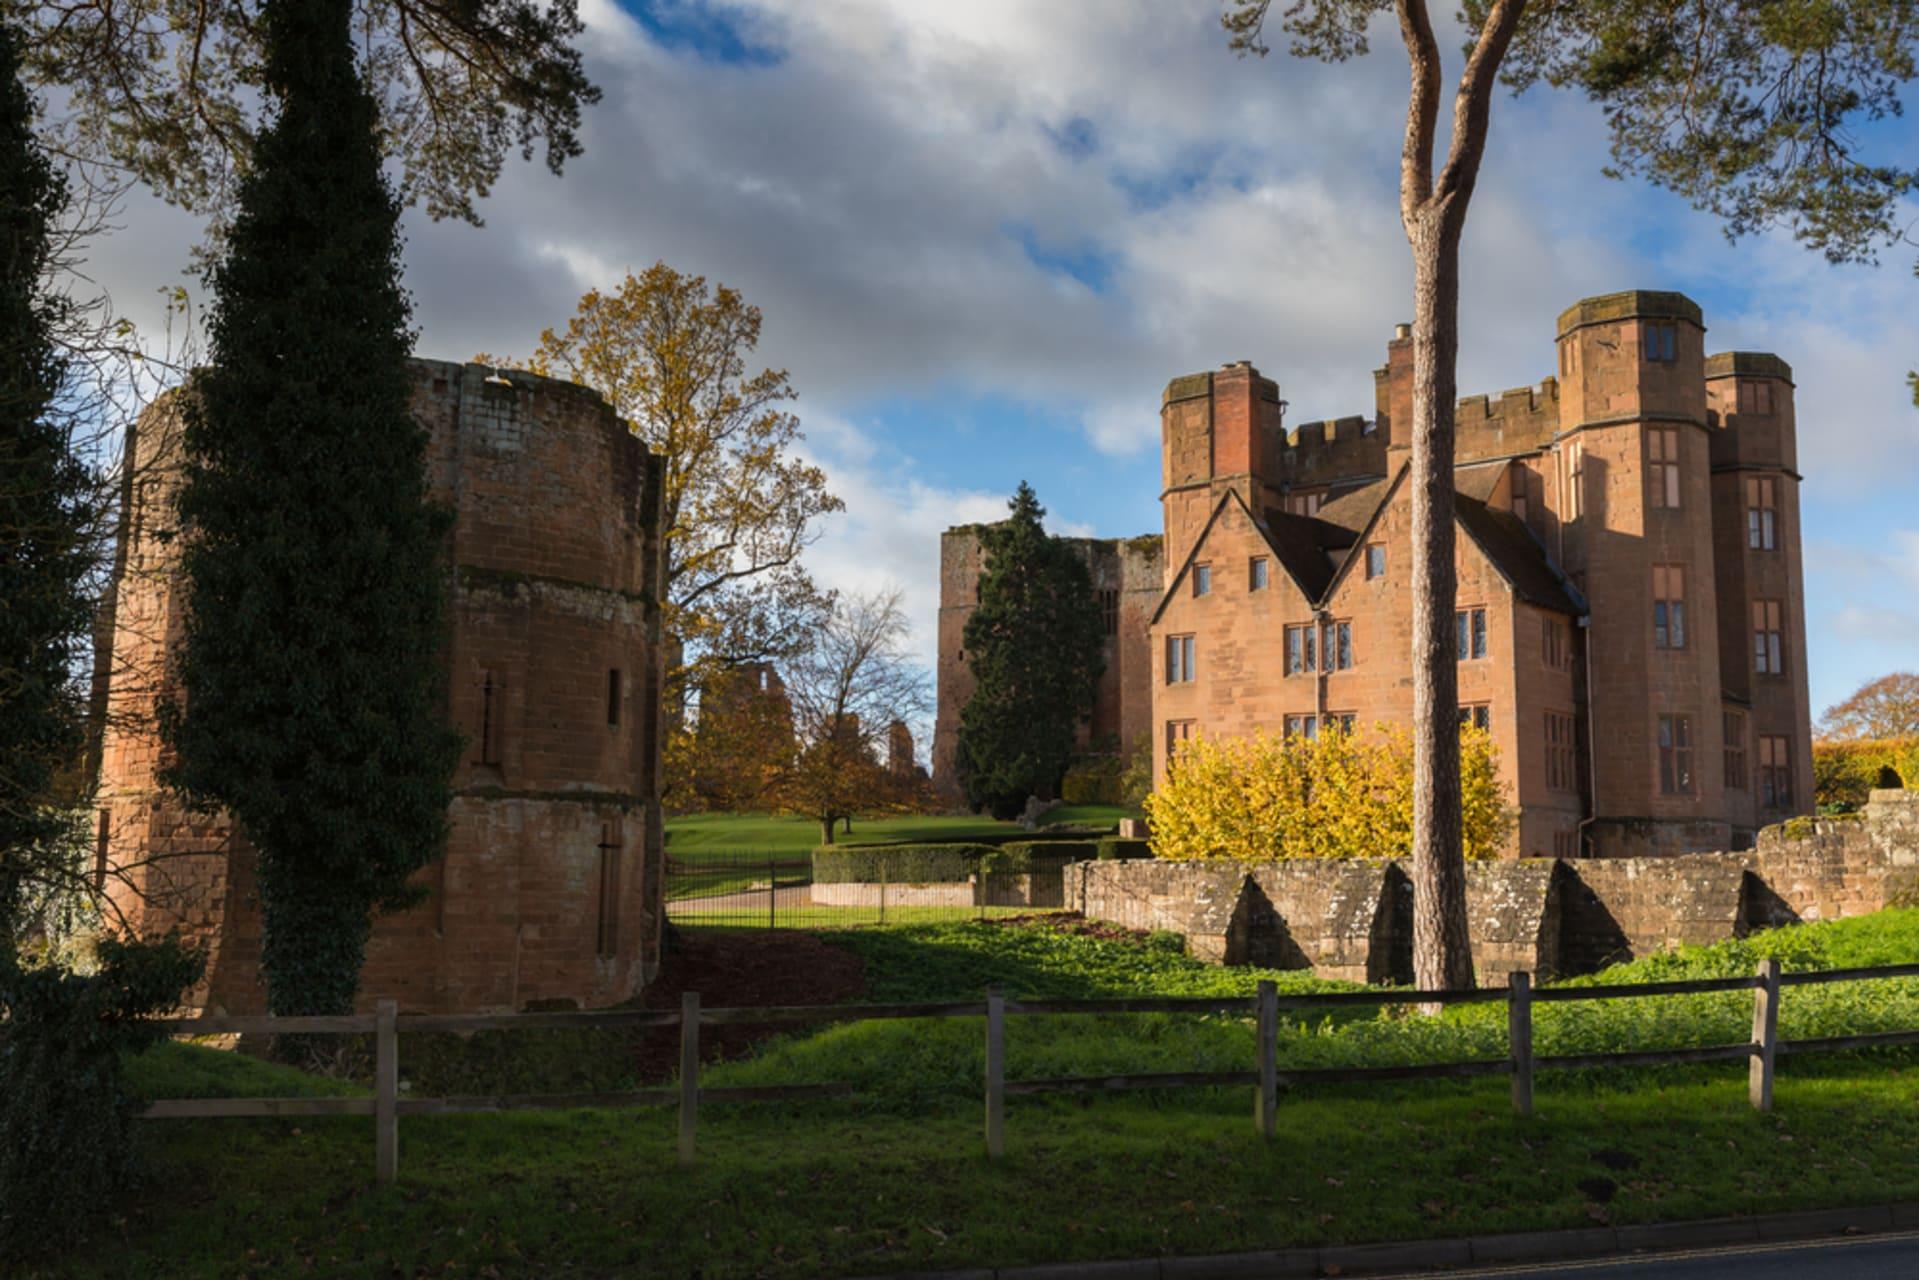 Kenilworth - Kenilworth Castle - Fortress, Palace, Ruin